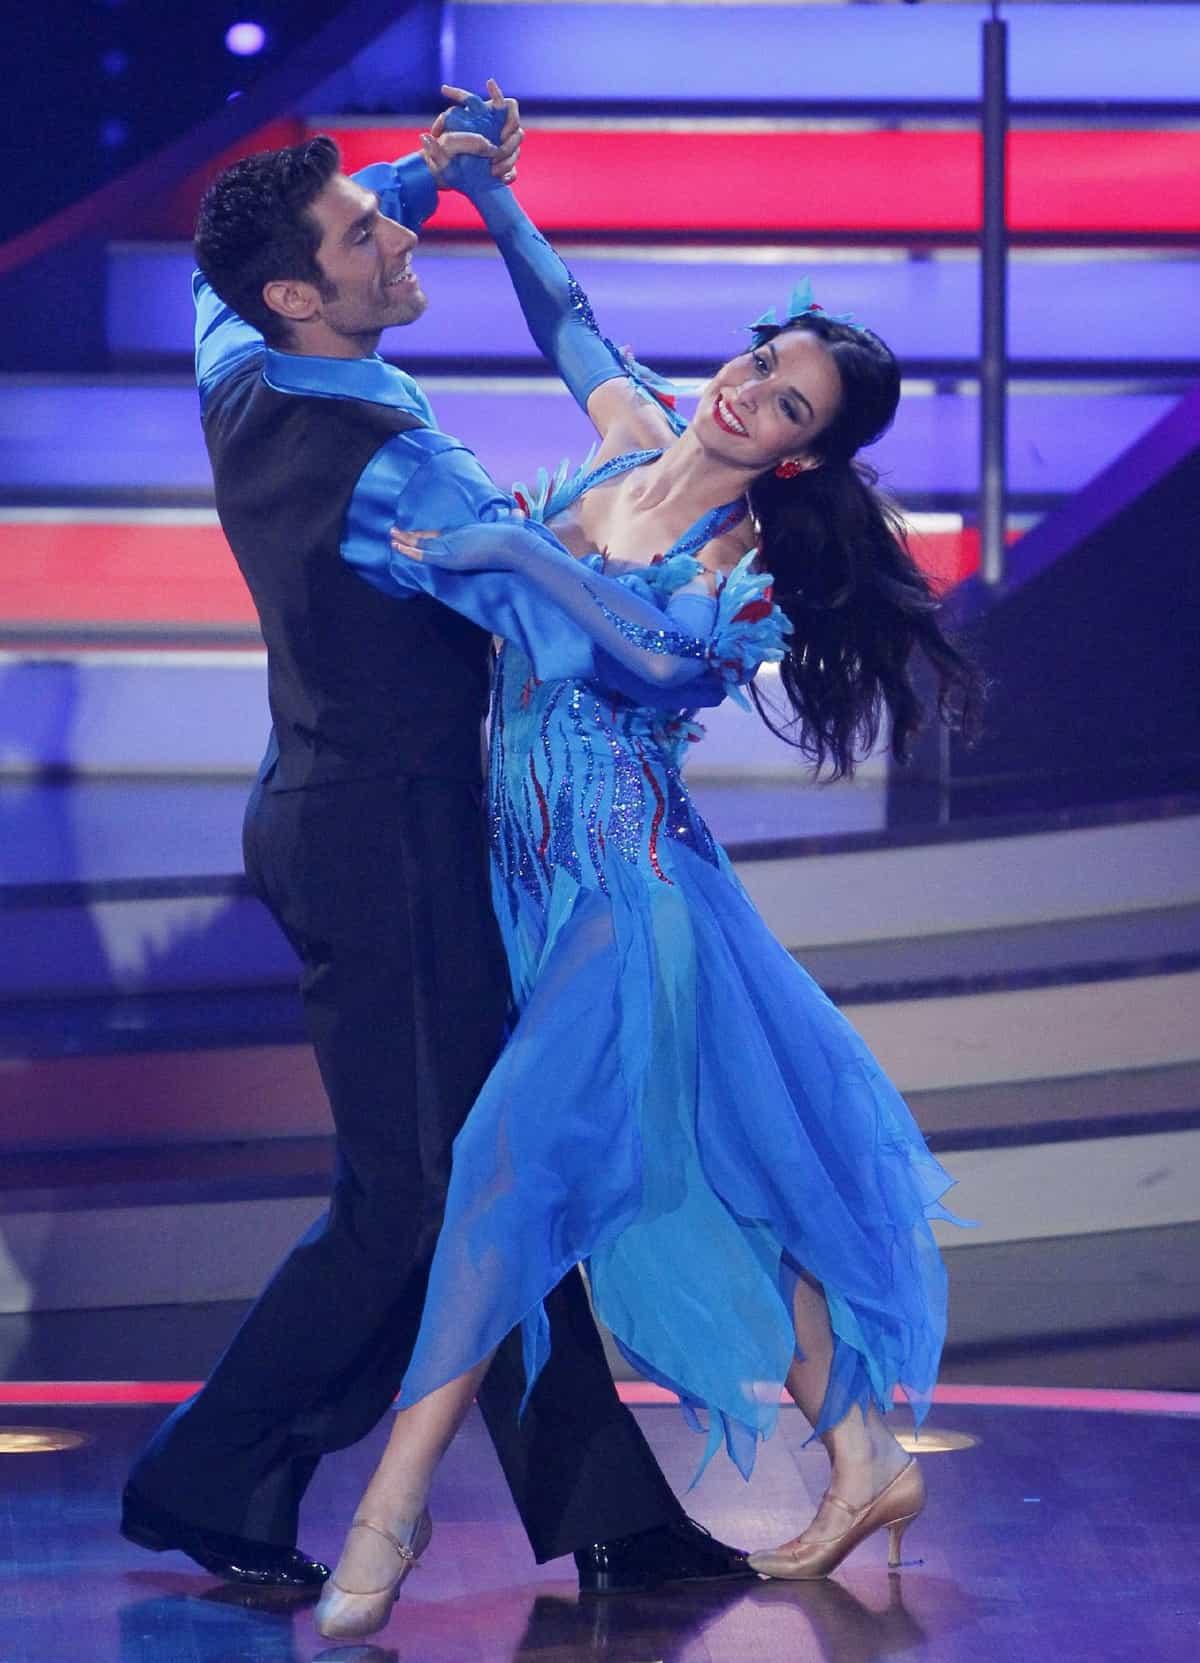 Sila Sahin - Christian Polanc bei Let's dance am 28.5.2020, ursprünglich bei Let's dance 2013 Platz 2